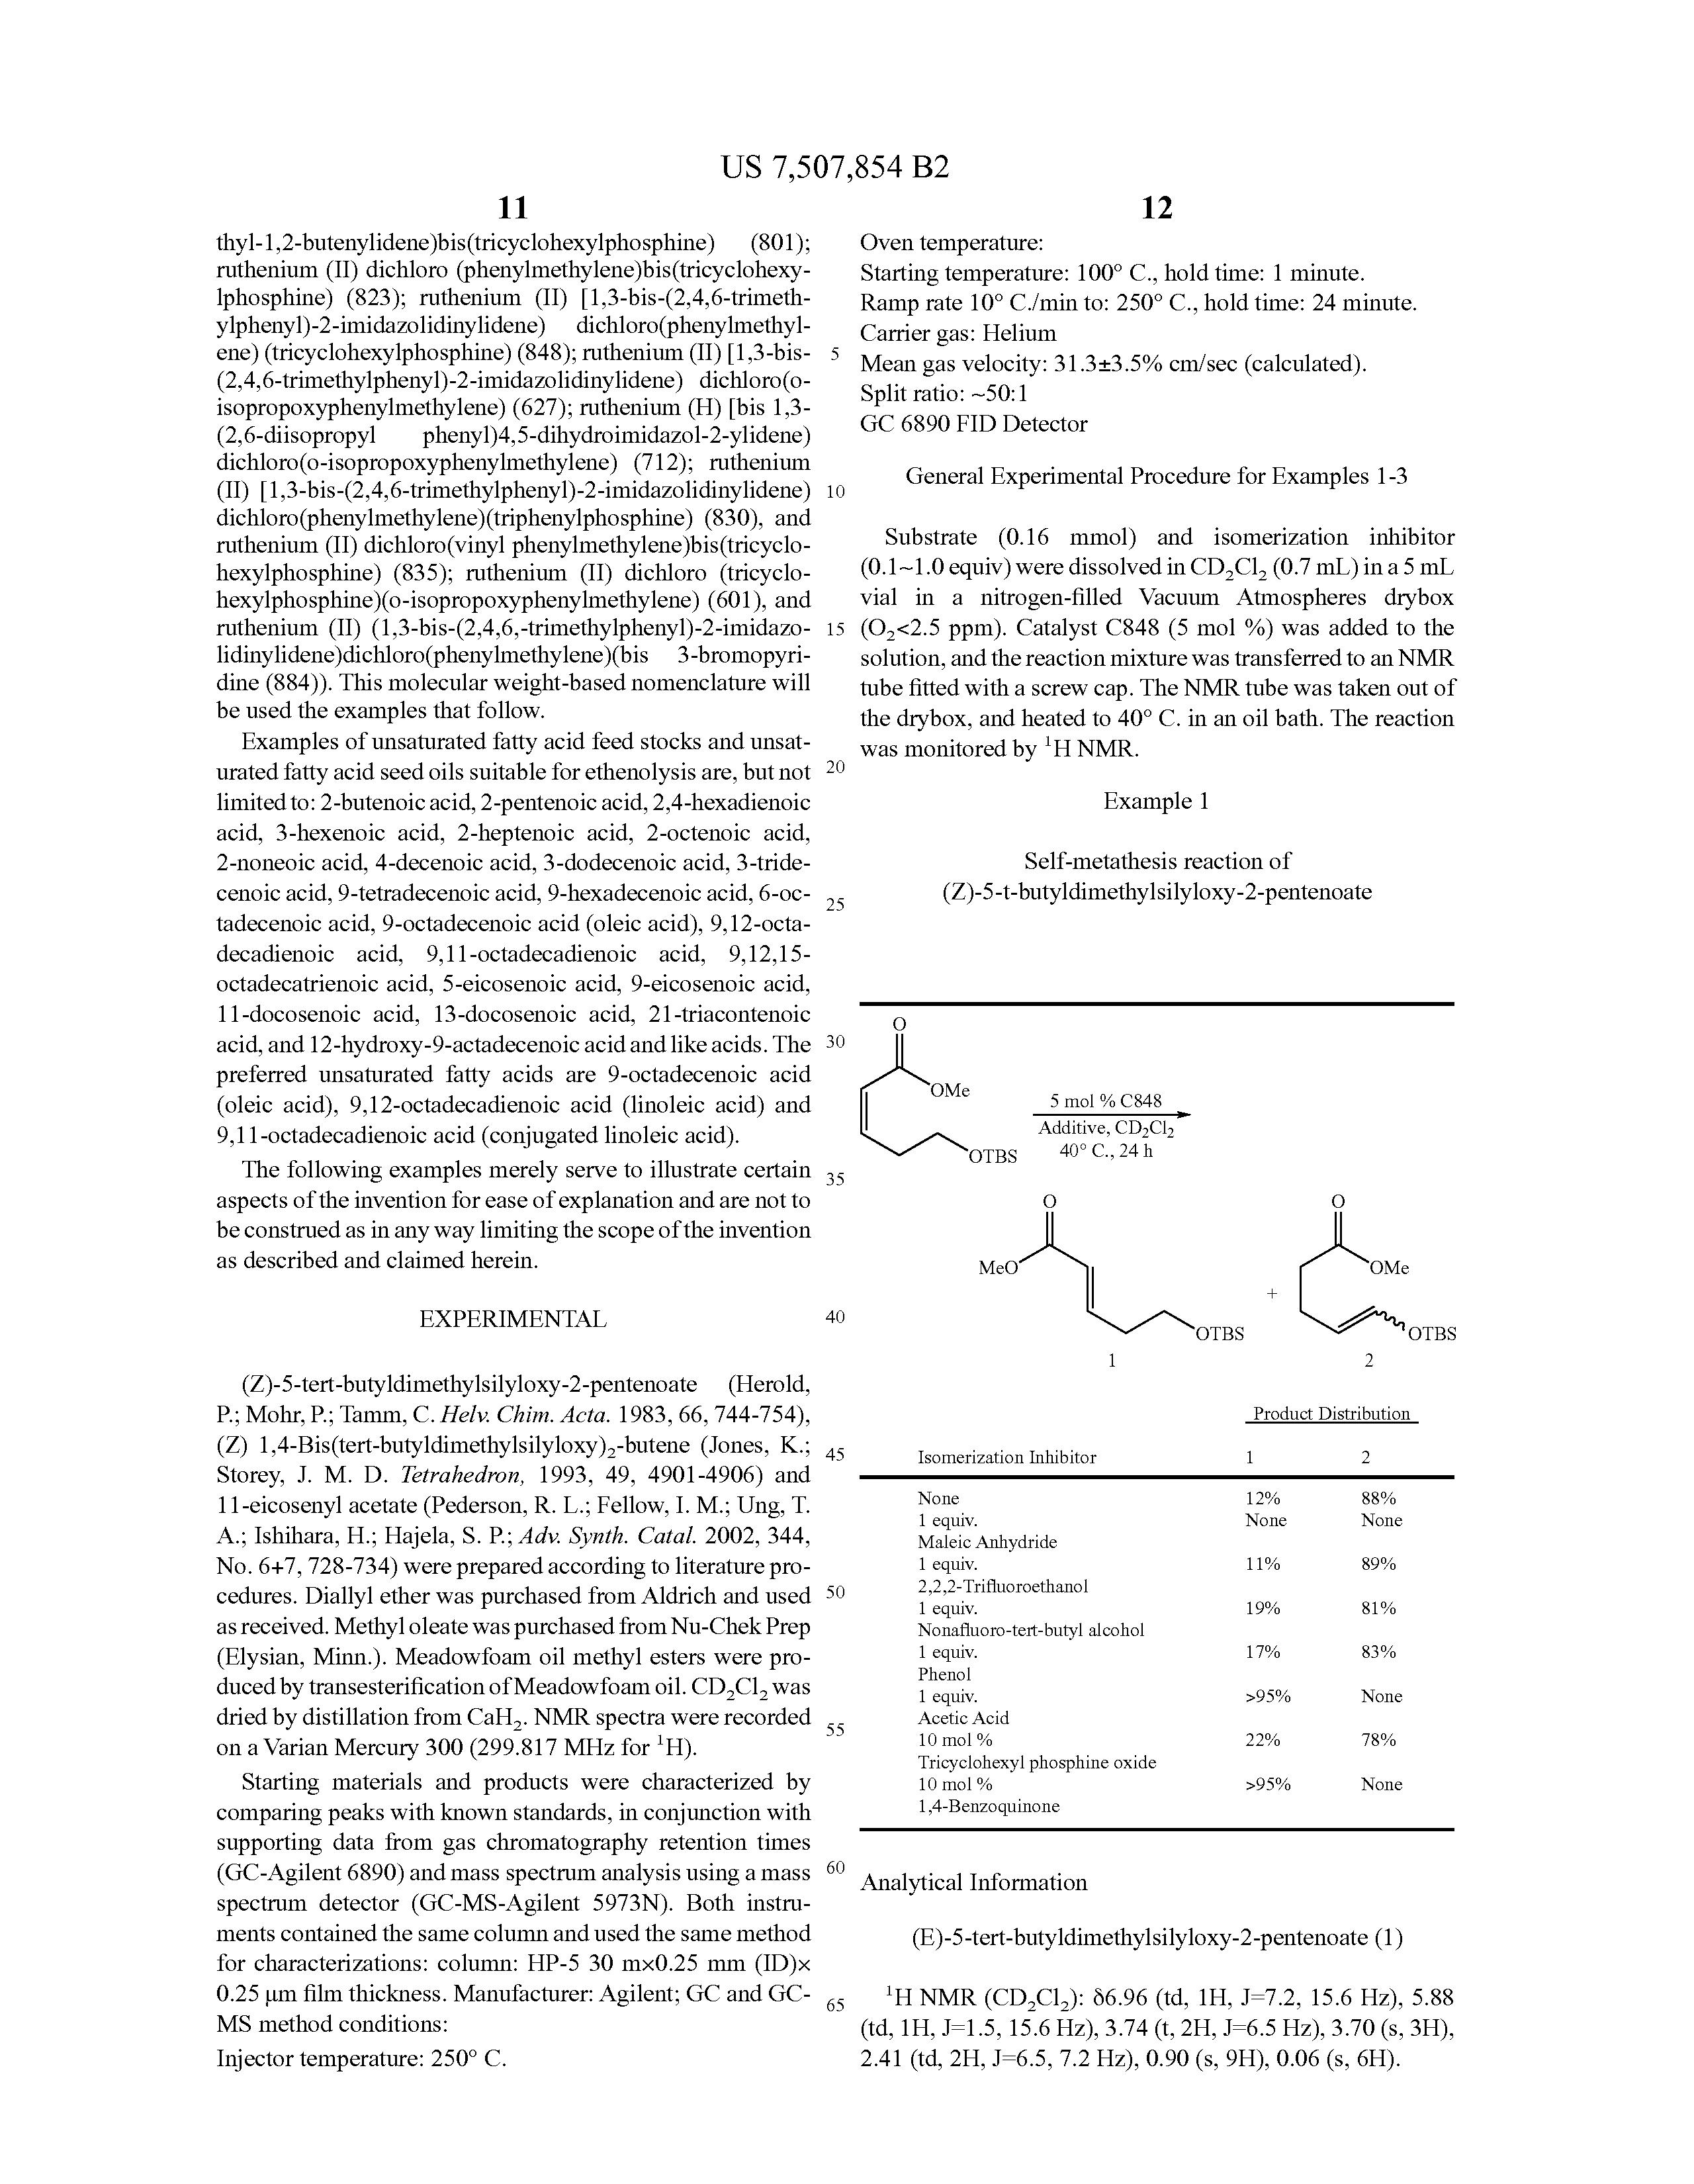 metathesis reactions of fatty acid esters 1 prog lipid res 198524(3):243-67 metathesis reactions of fatty acid esters boelhouwer c, mol jc pmid: 3916241 [pubmed - indexed for medline.